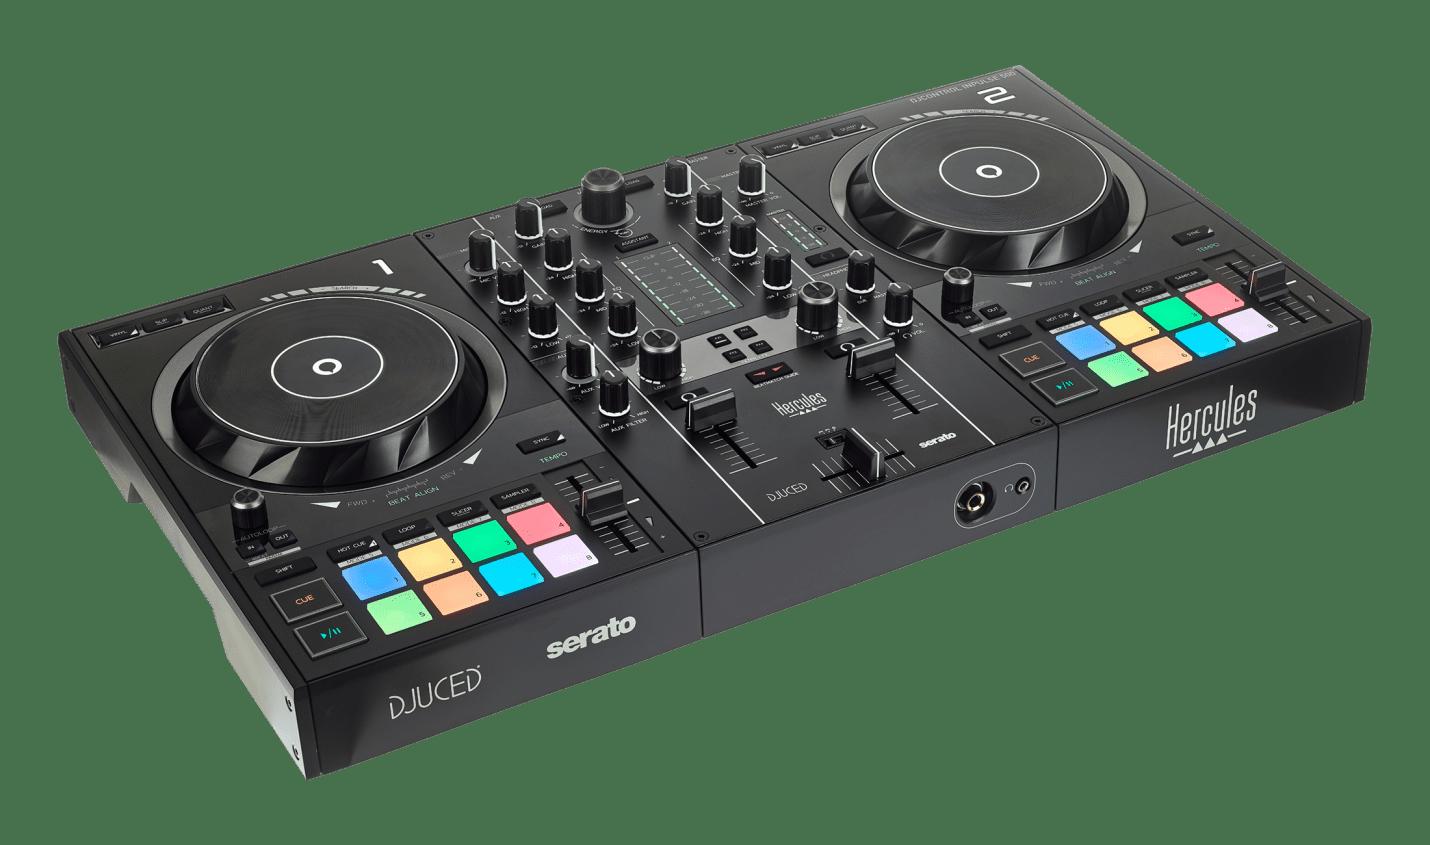 Test: Hercules DJControl Inpulse 500 / DJ-Controller